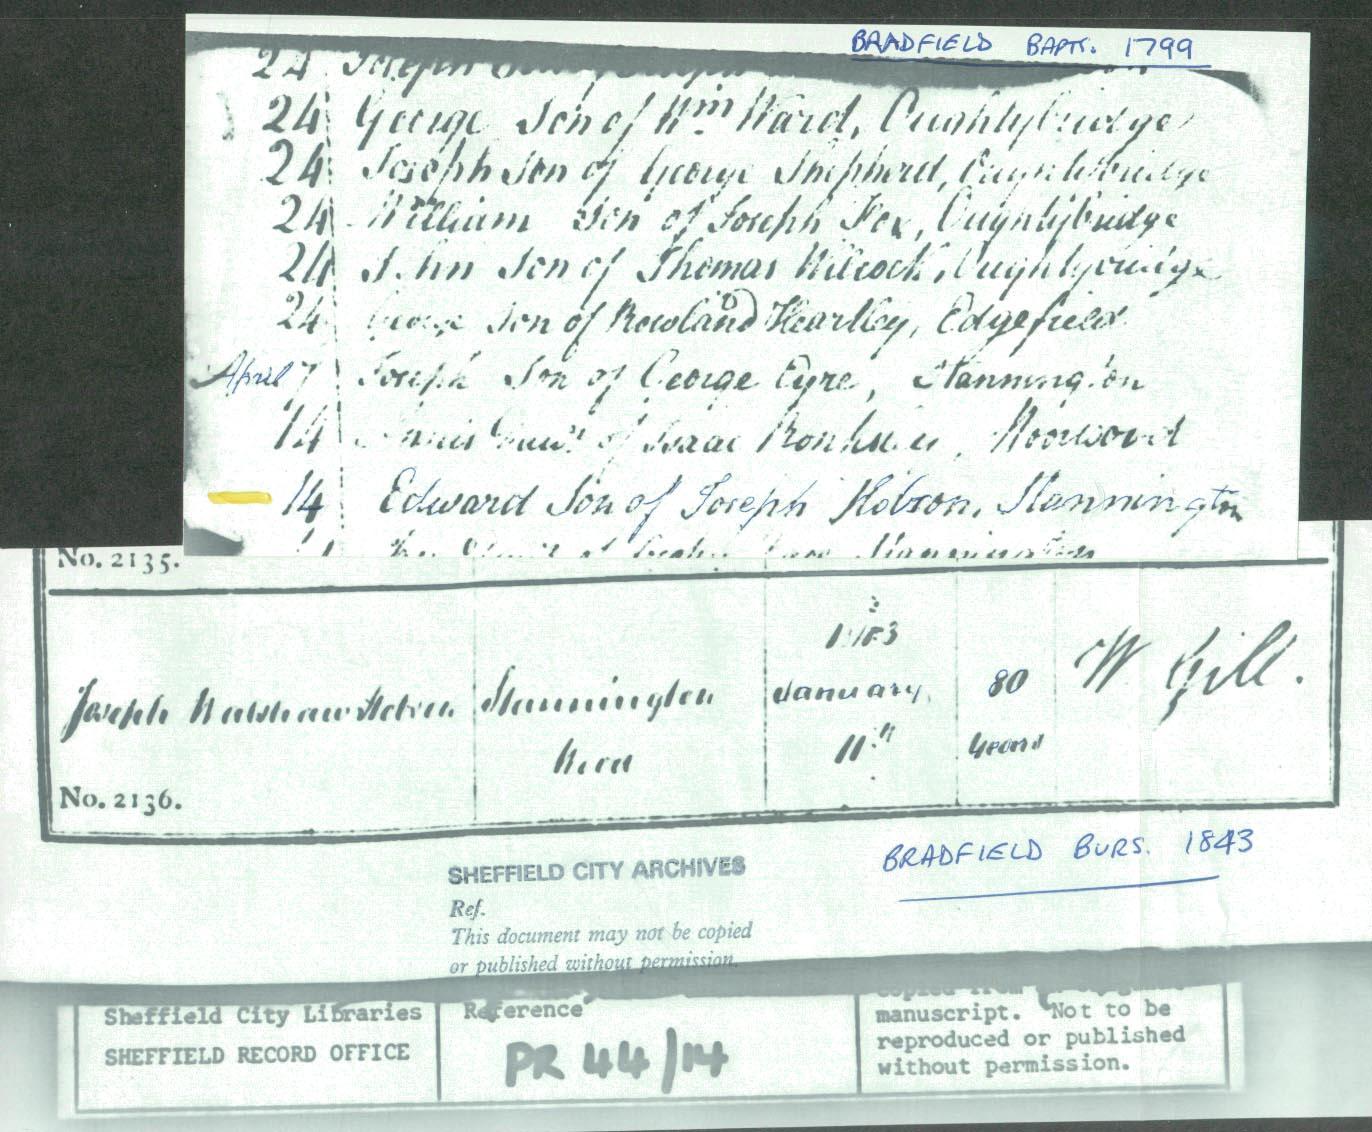 Edward son of Joseph Walshaw Hobson